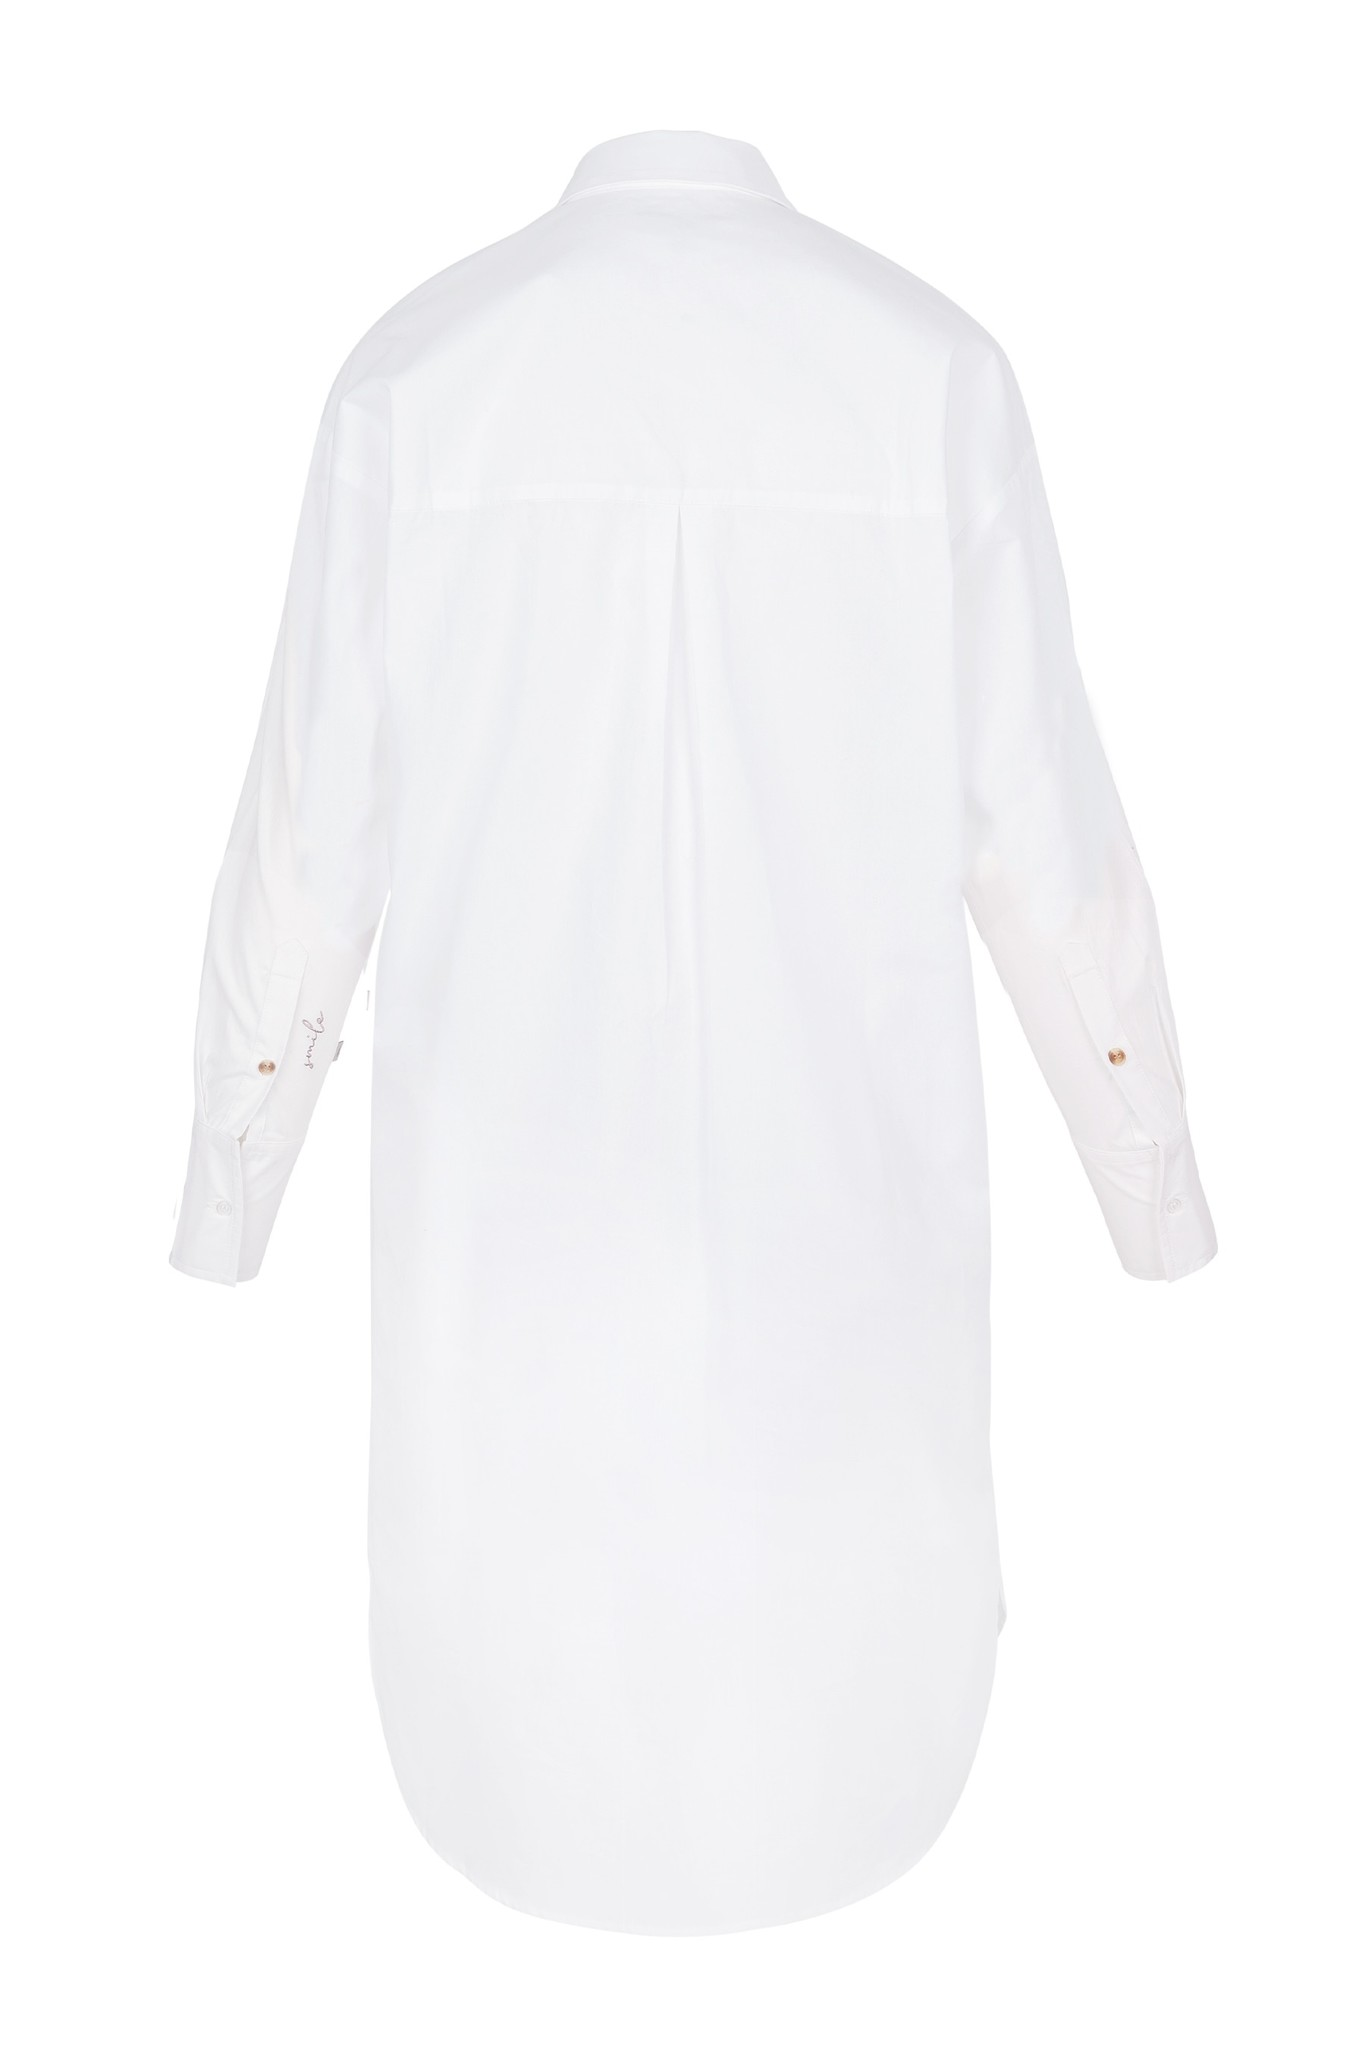 Zusss blousejurk wit